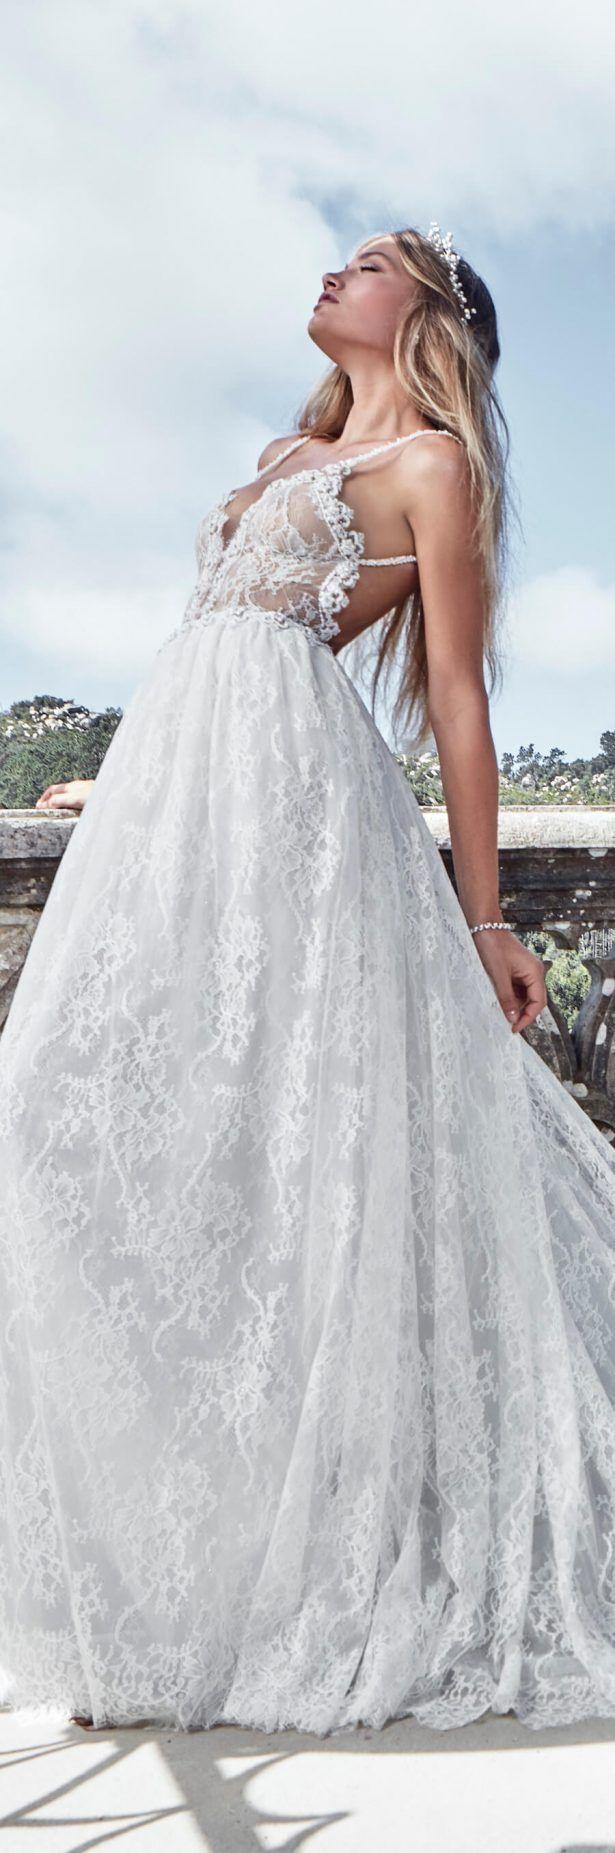 Solo merav wedding dress collection wedding pinterest